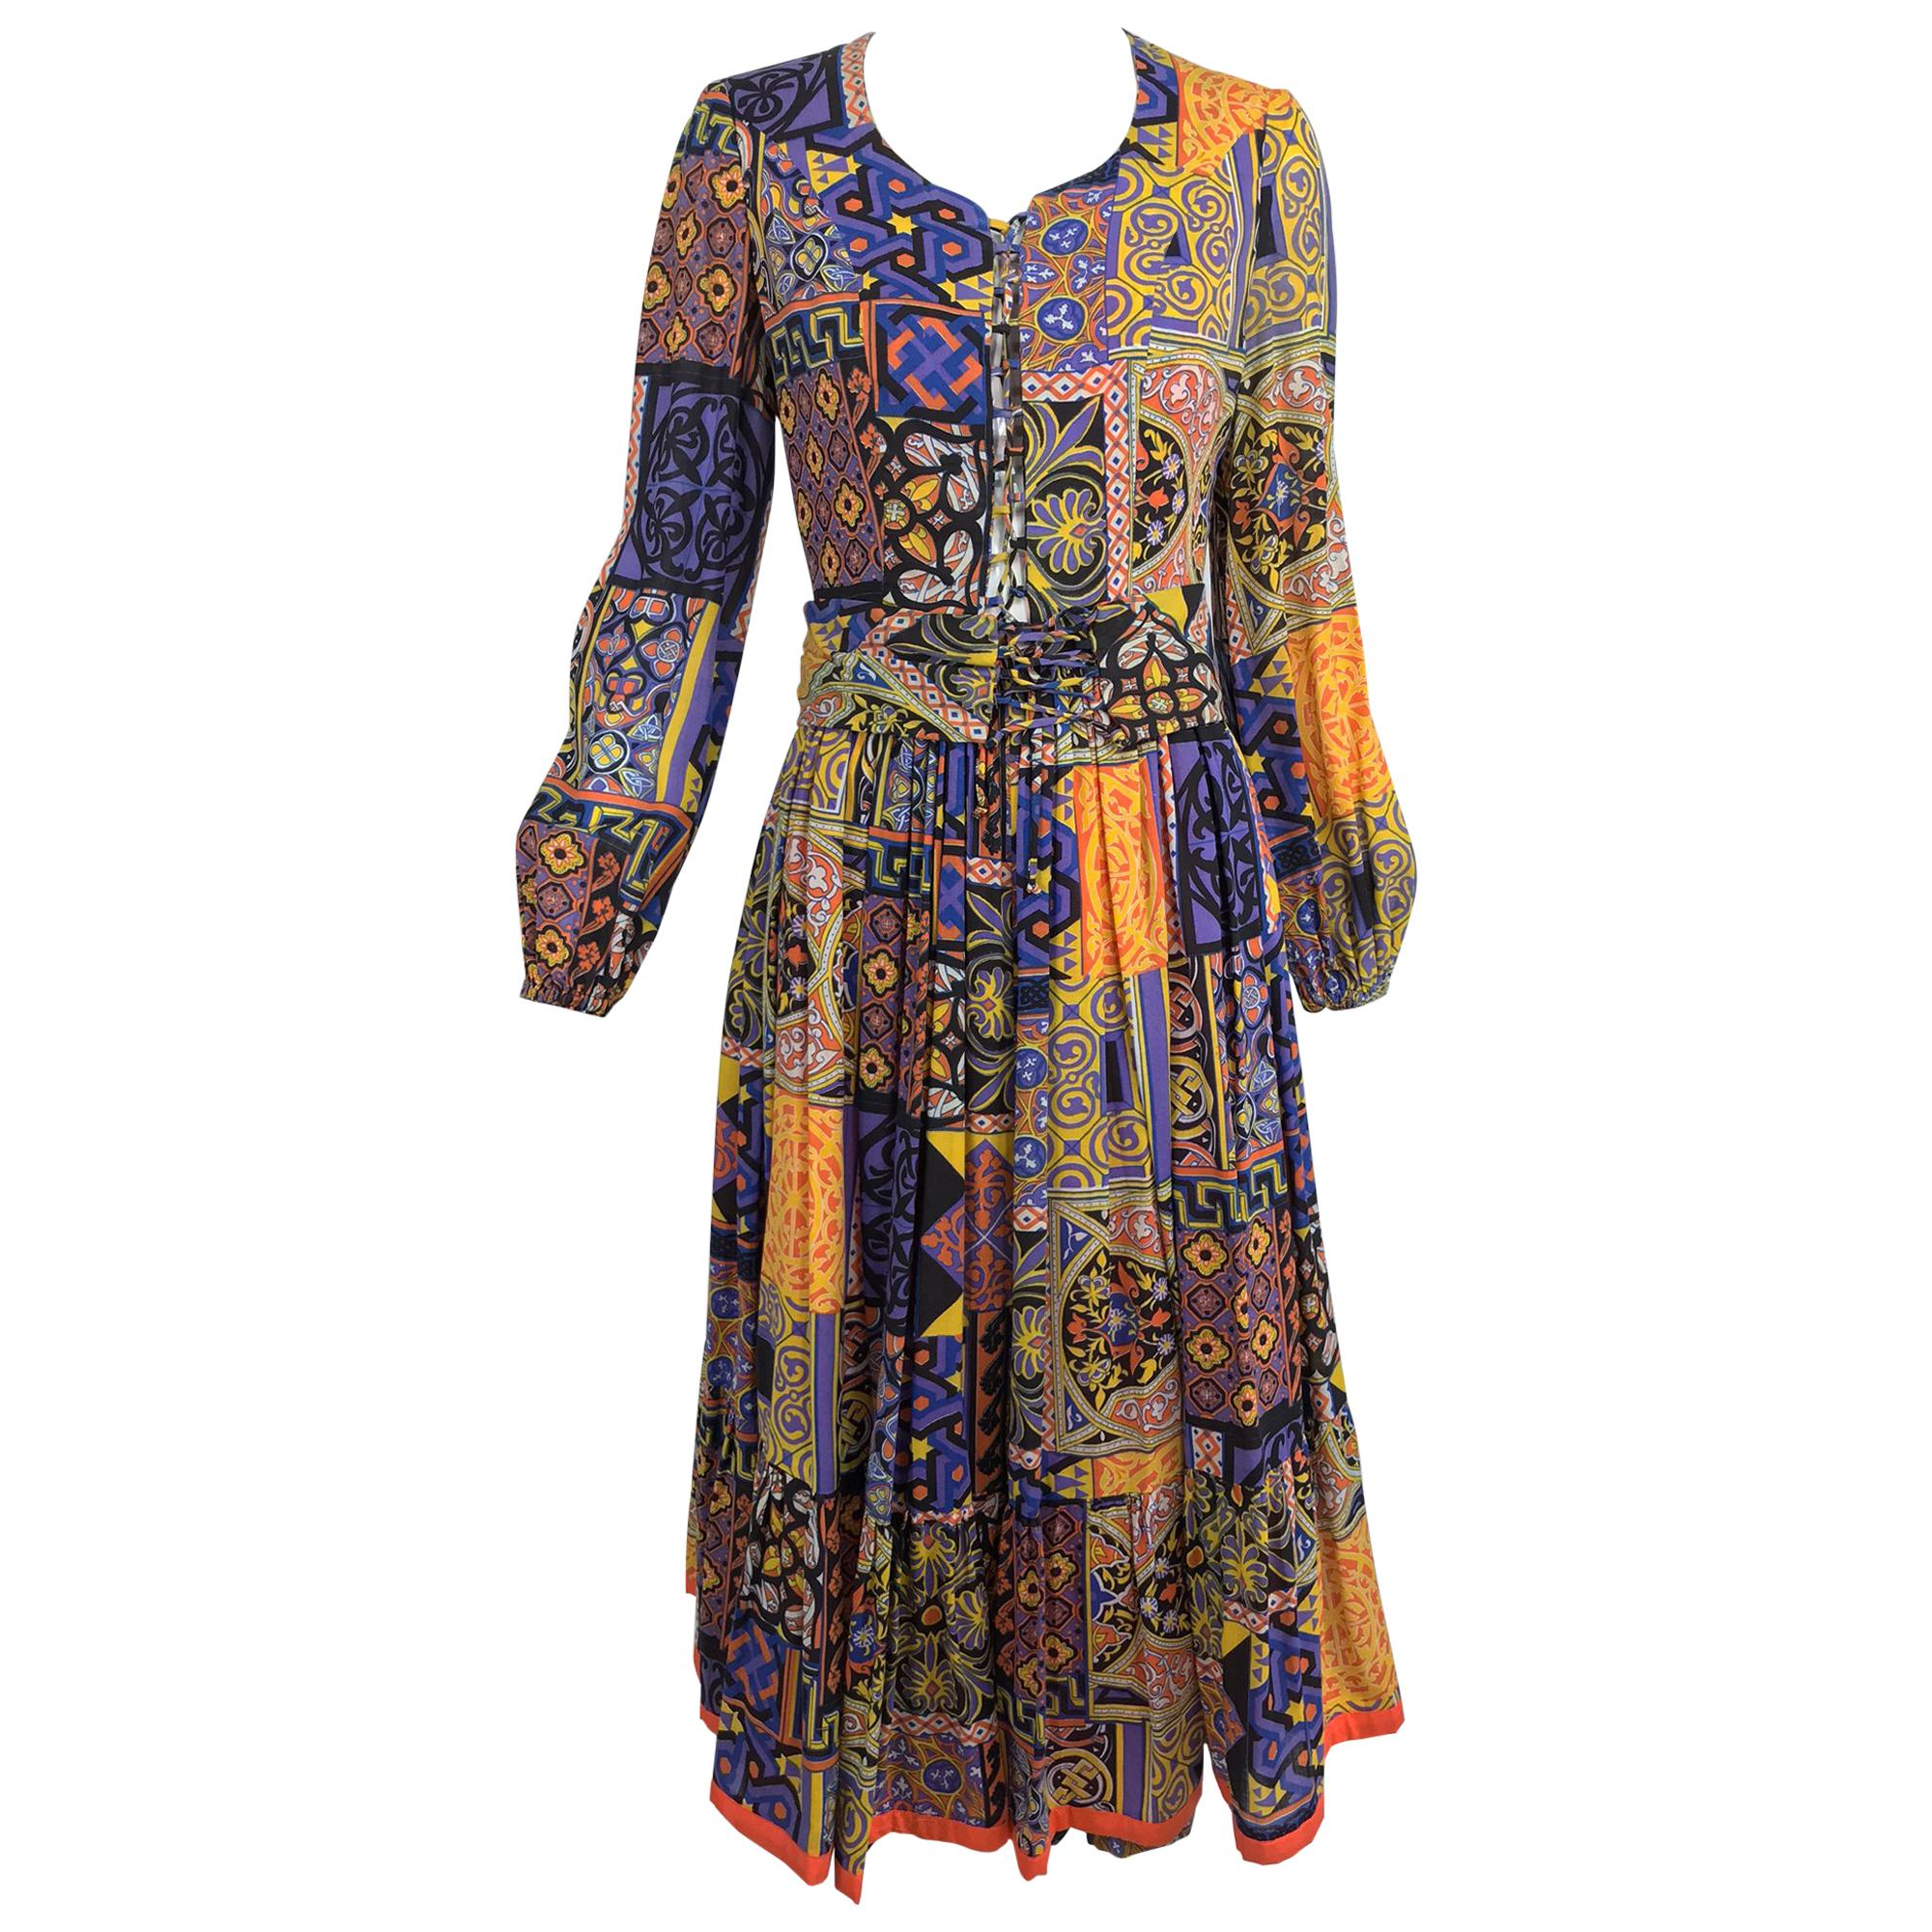 6ce611d5d0 Palm Beach Vintage Day Dresses - 1stdibs